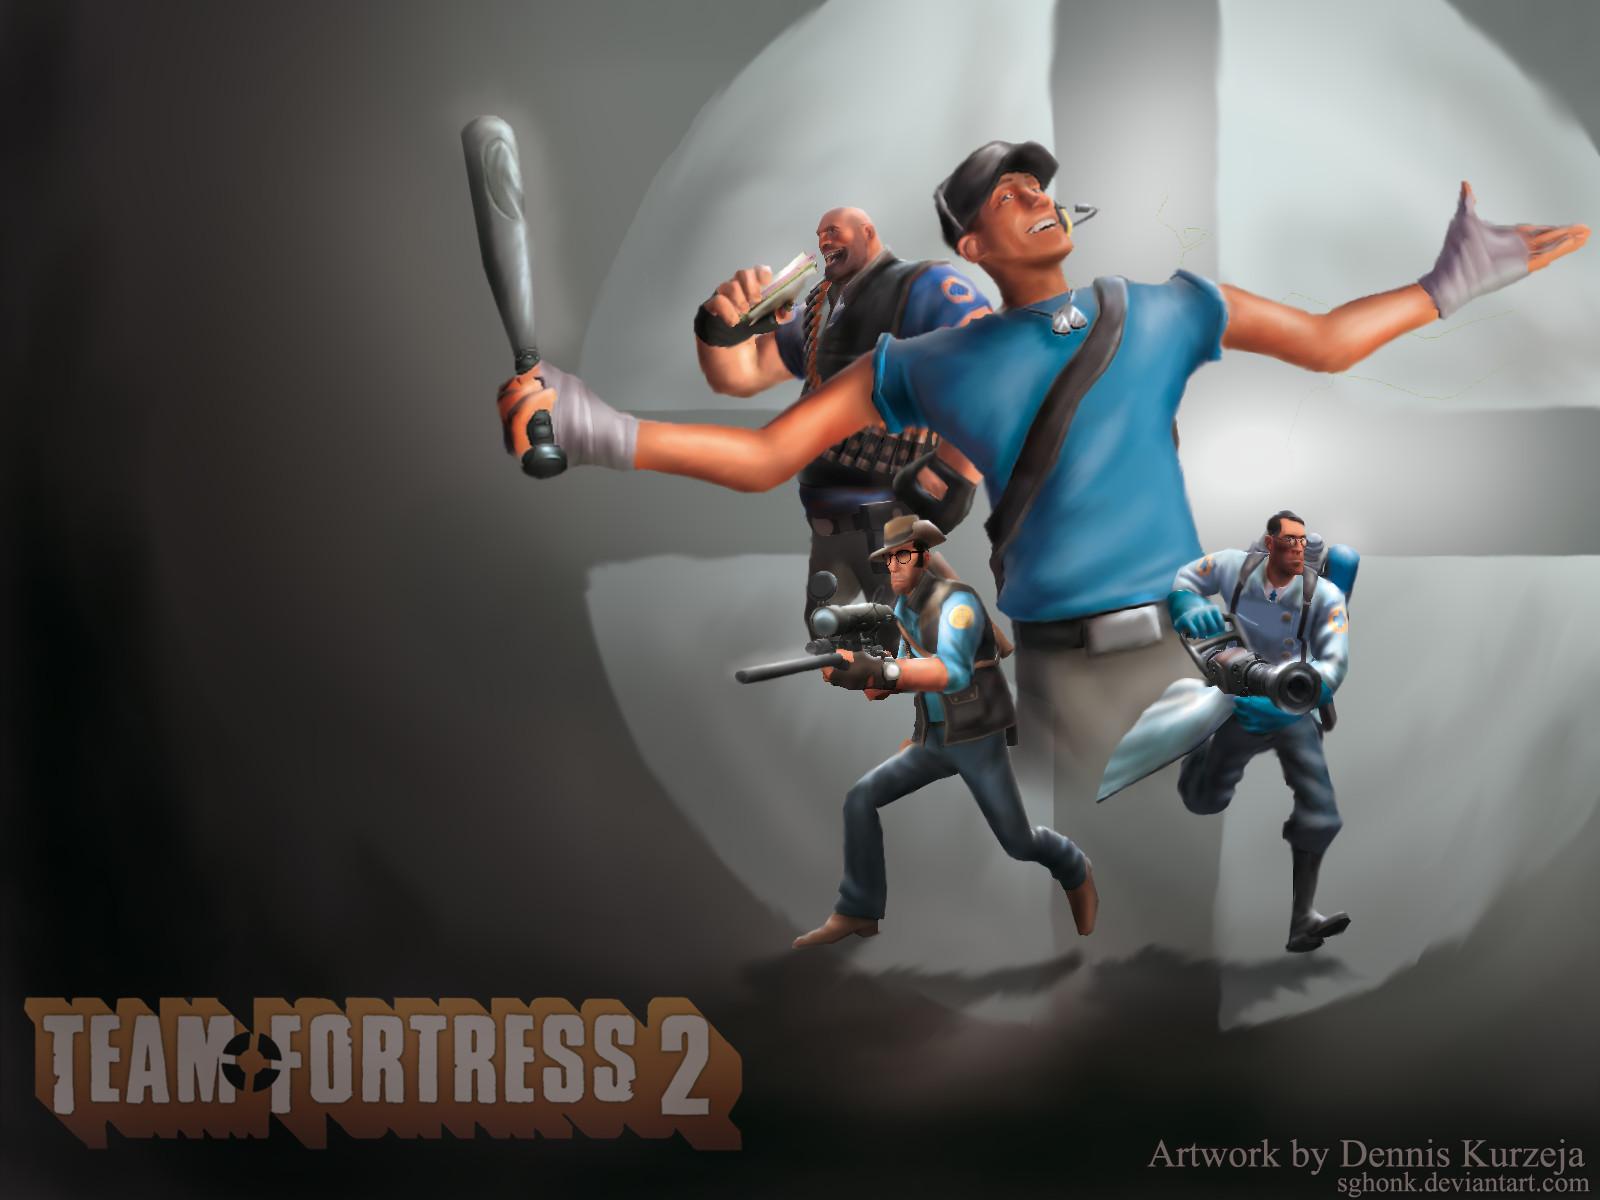 Team Fortress 2 The Top 10 Updates news - Mod DB